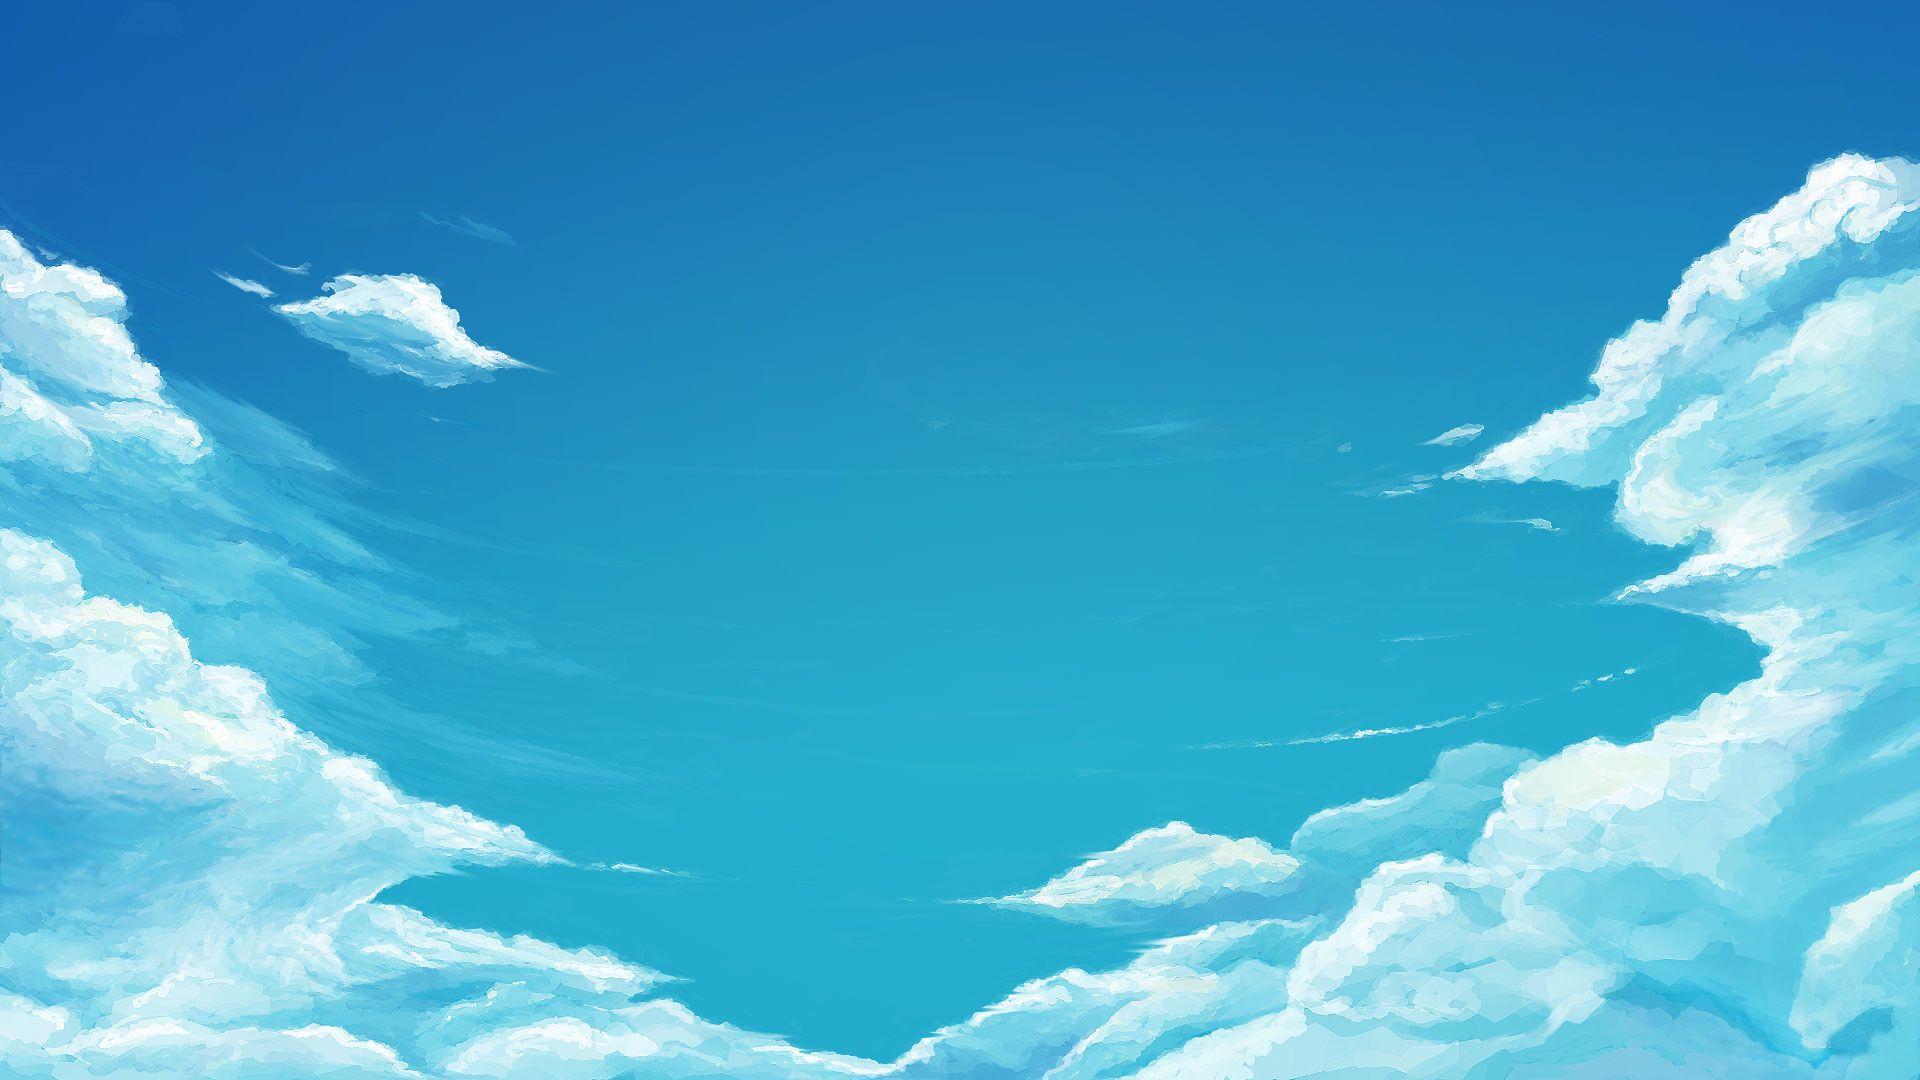 Anime sky wallpapers paisagens - Anime sky background ...